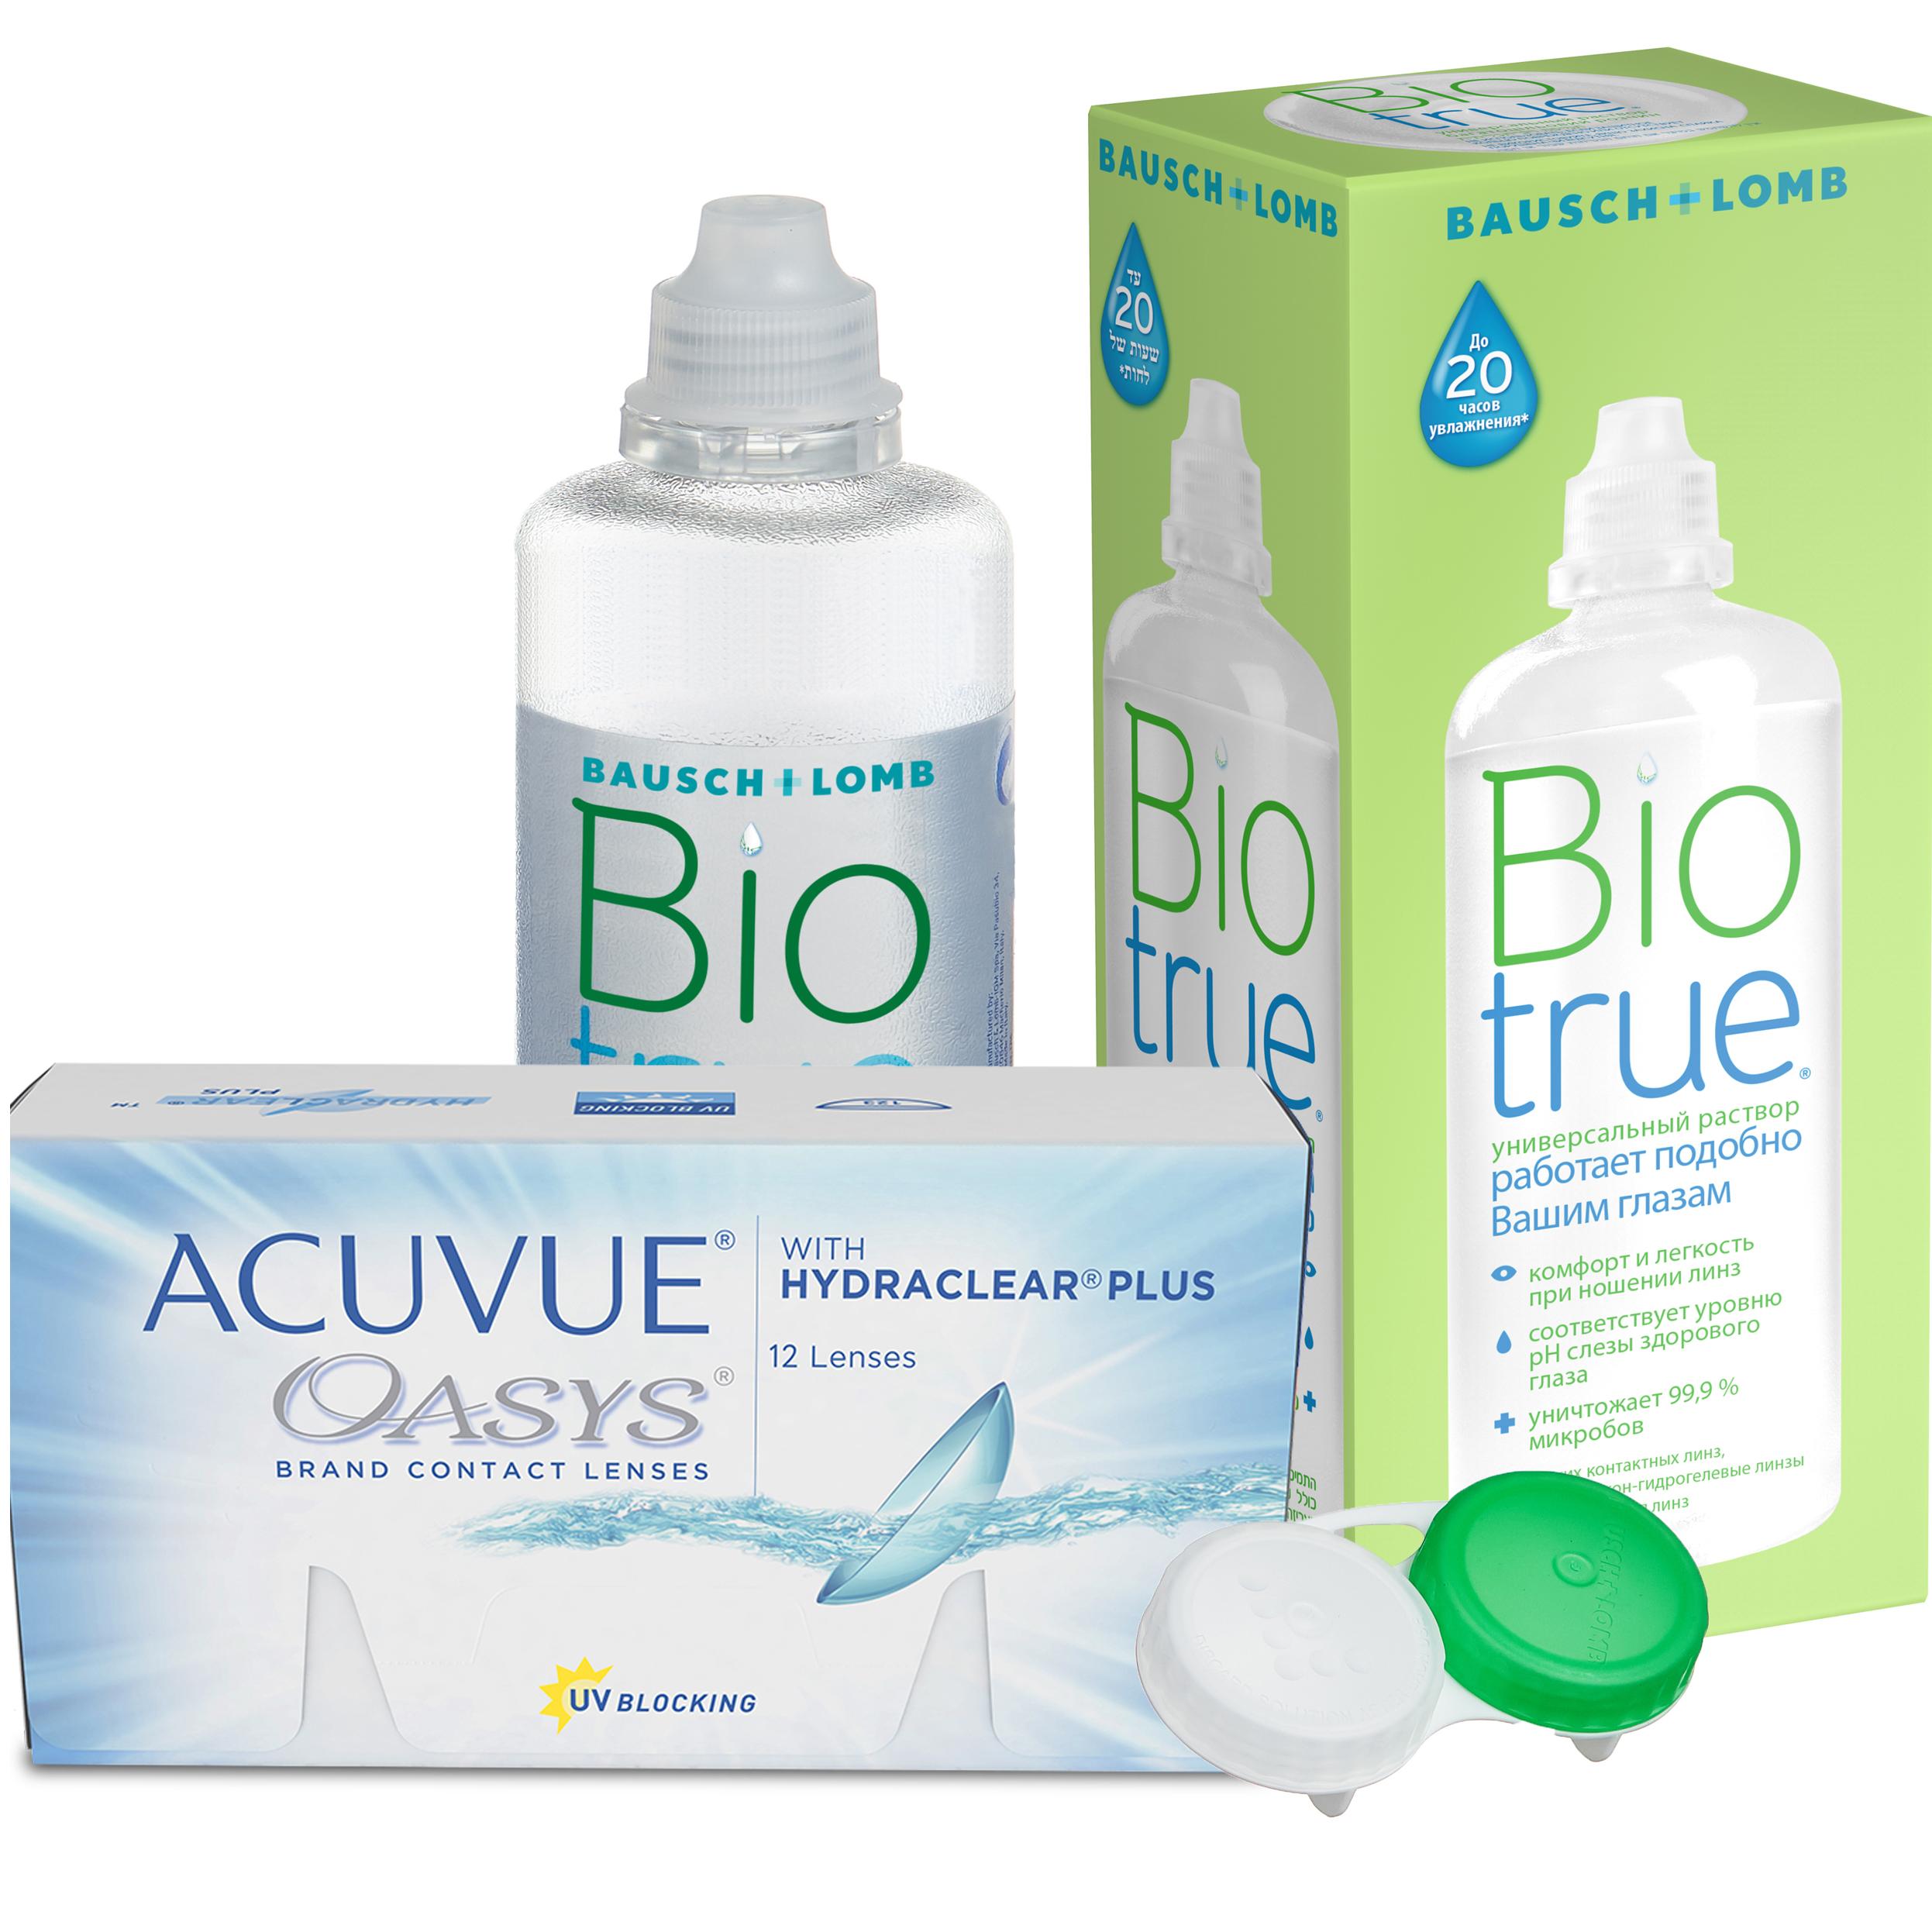 Купить Oasys with Hydraclear Plus 12 линз + Biotrue, Контактные линзы Acuvue Oasys with Hydraclear Plus 12 линз R 8.8 +4, 50 + Biotrue 300 мл